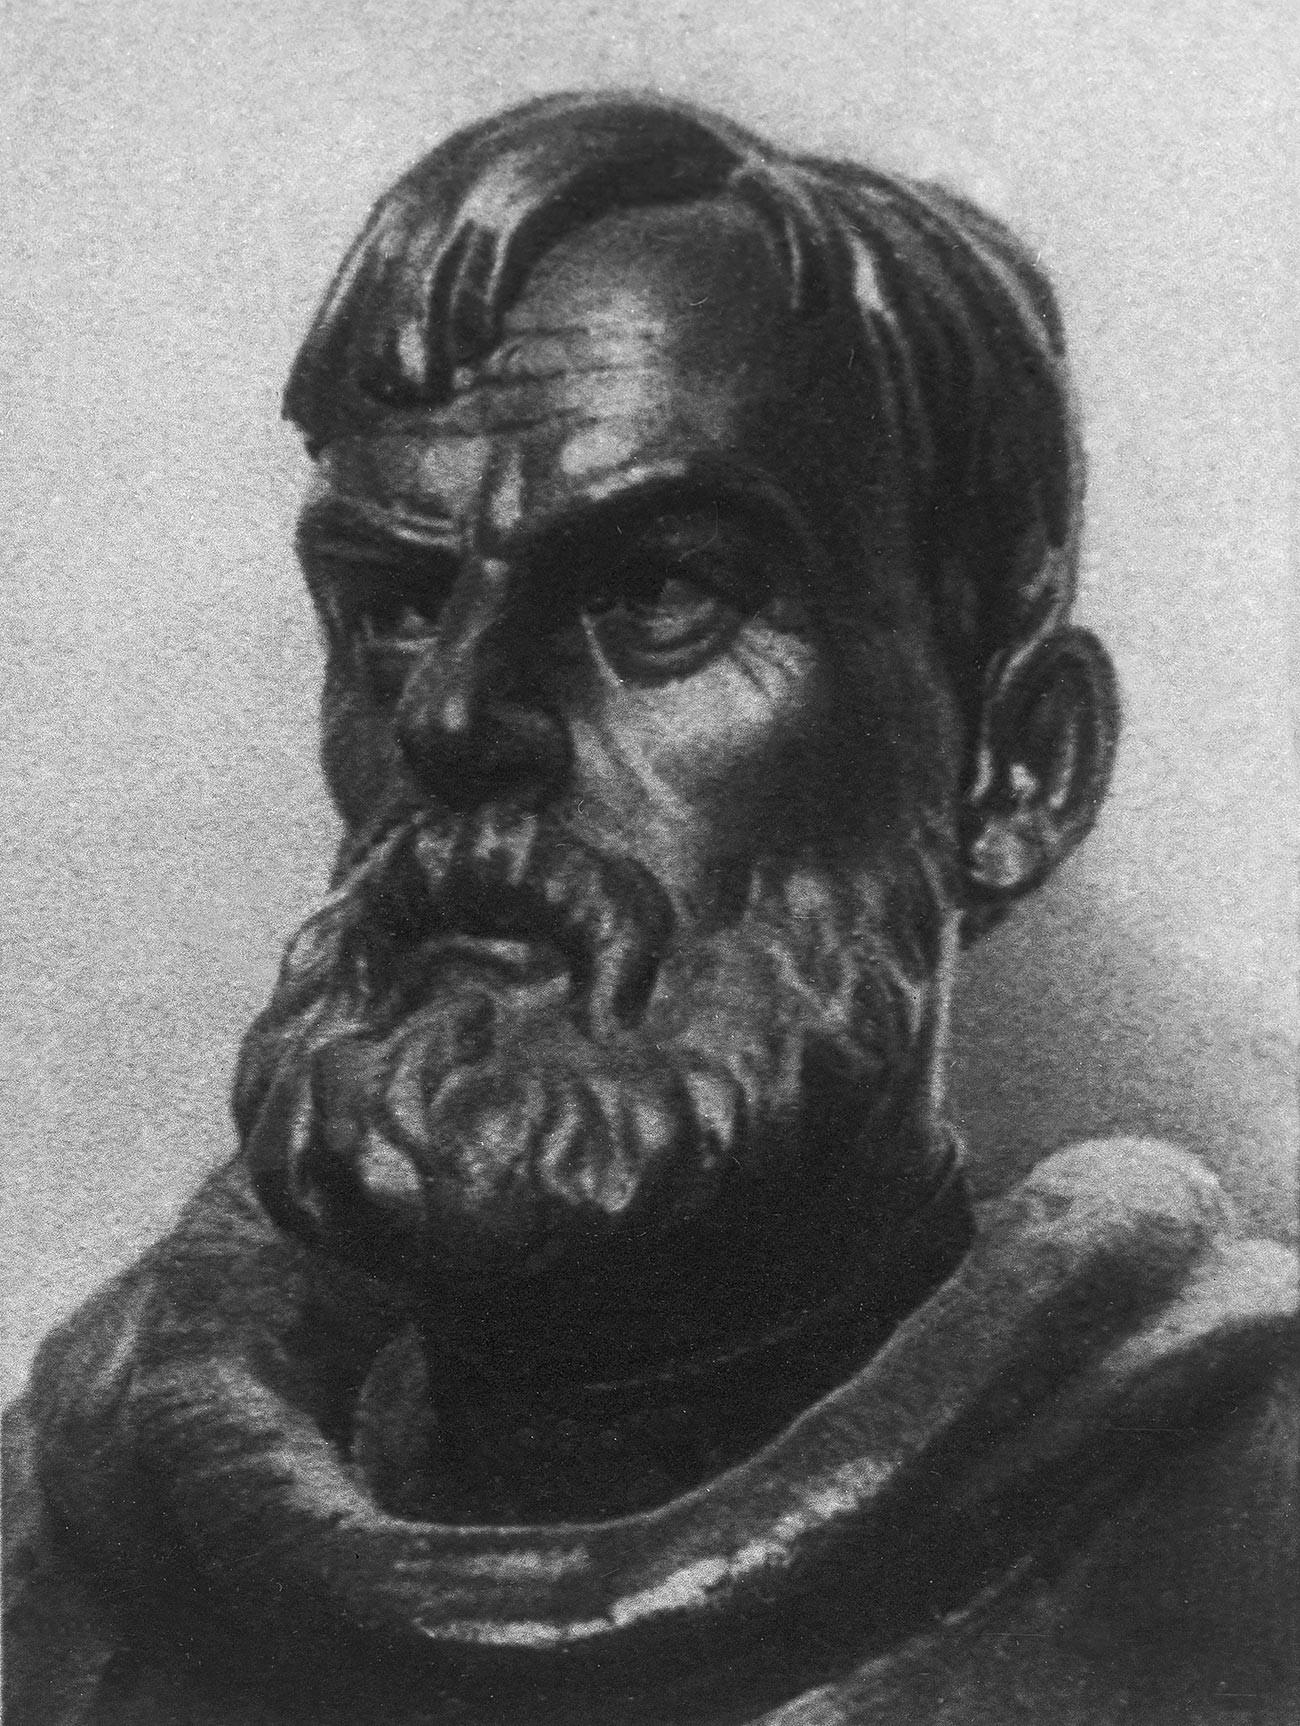 Semjon Ivanovič Dežnjov (1605.-1673.), ruski moreplovac.